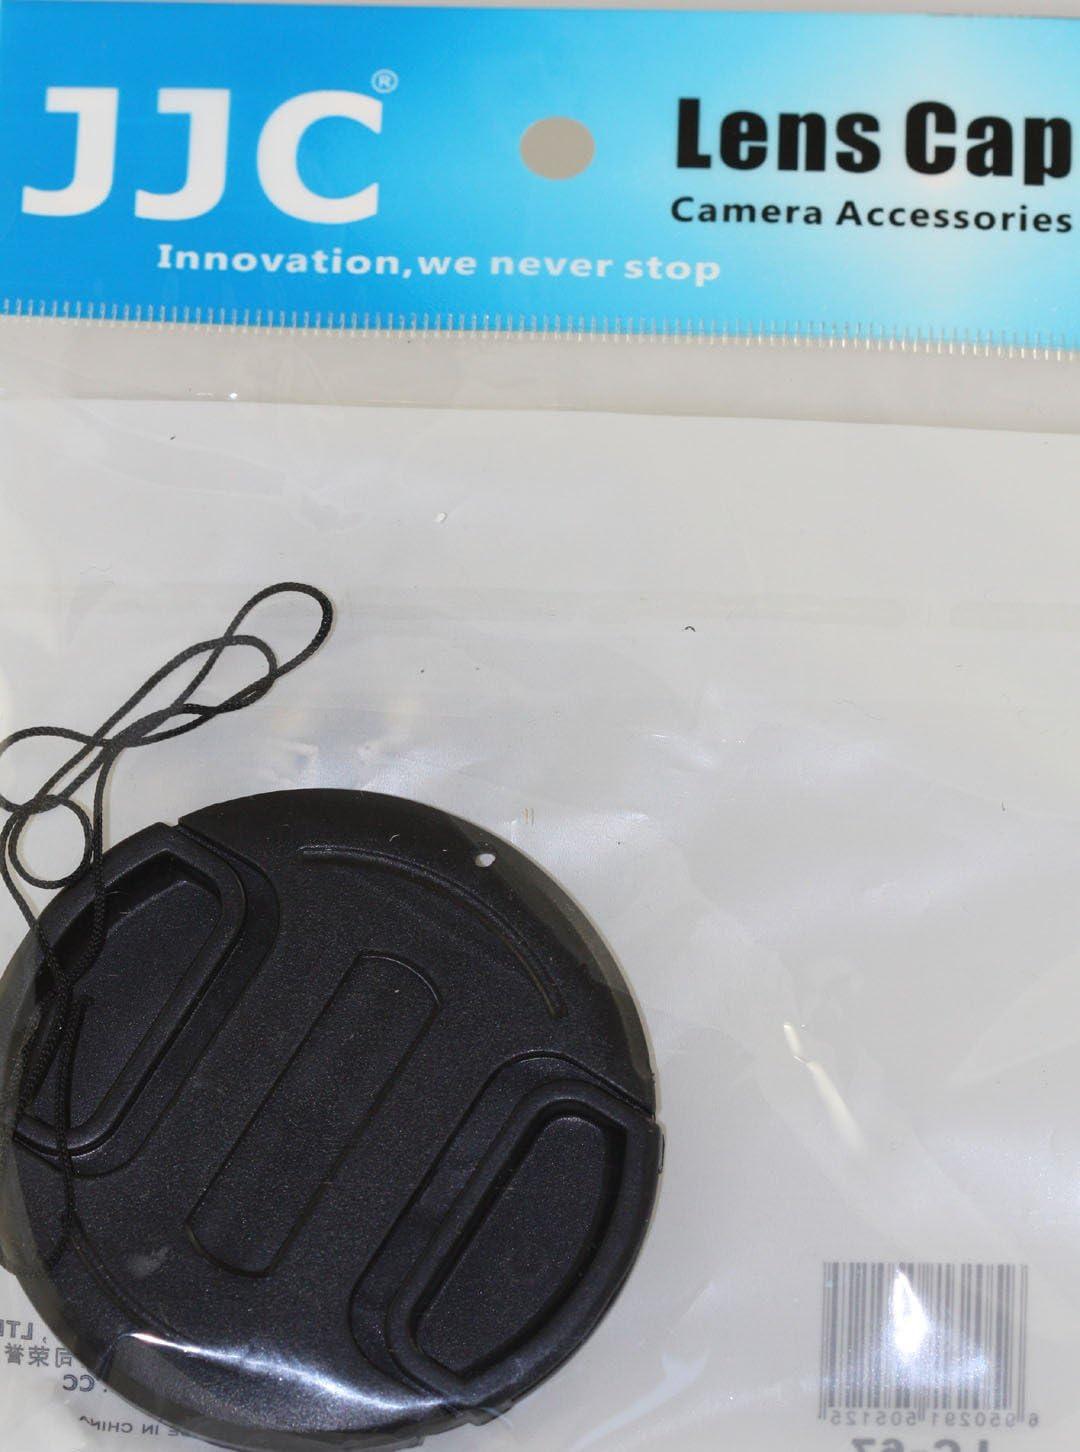 Front Lens Cap Cover for Olympus SP820, SP820UZ & Panasonic 14-42mm II Lens Camera with Cap Holder 46